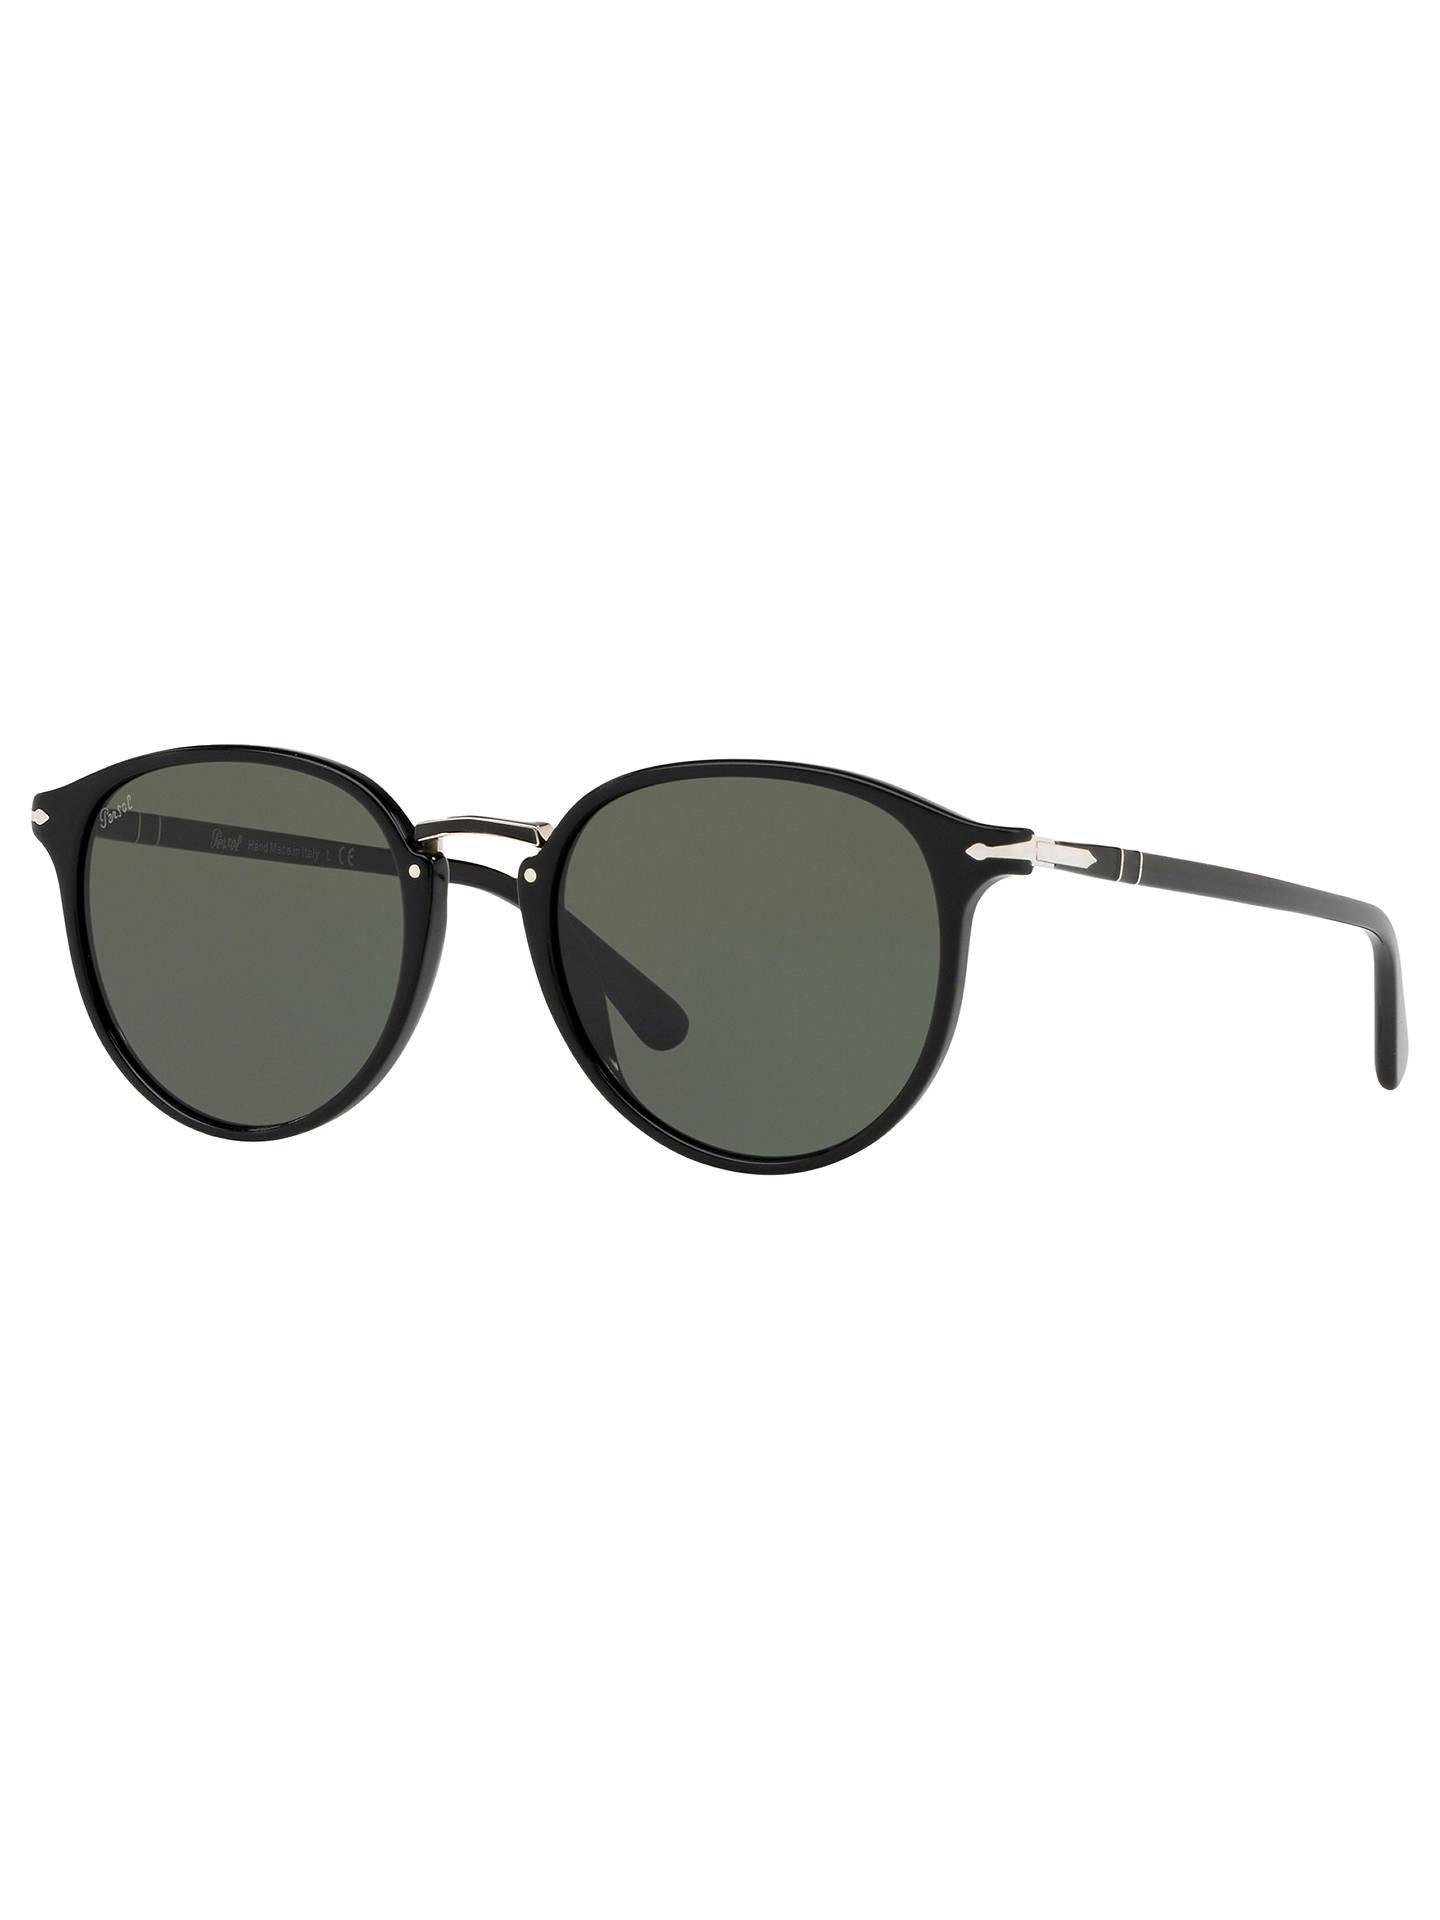 014eb46daad BuyPersol PO3210S Men s Oval Sunglasses